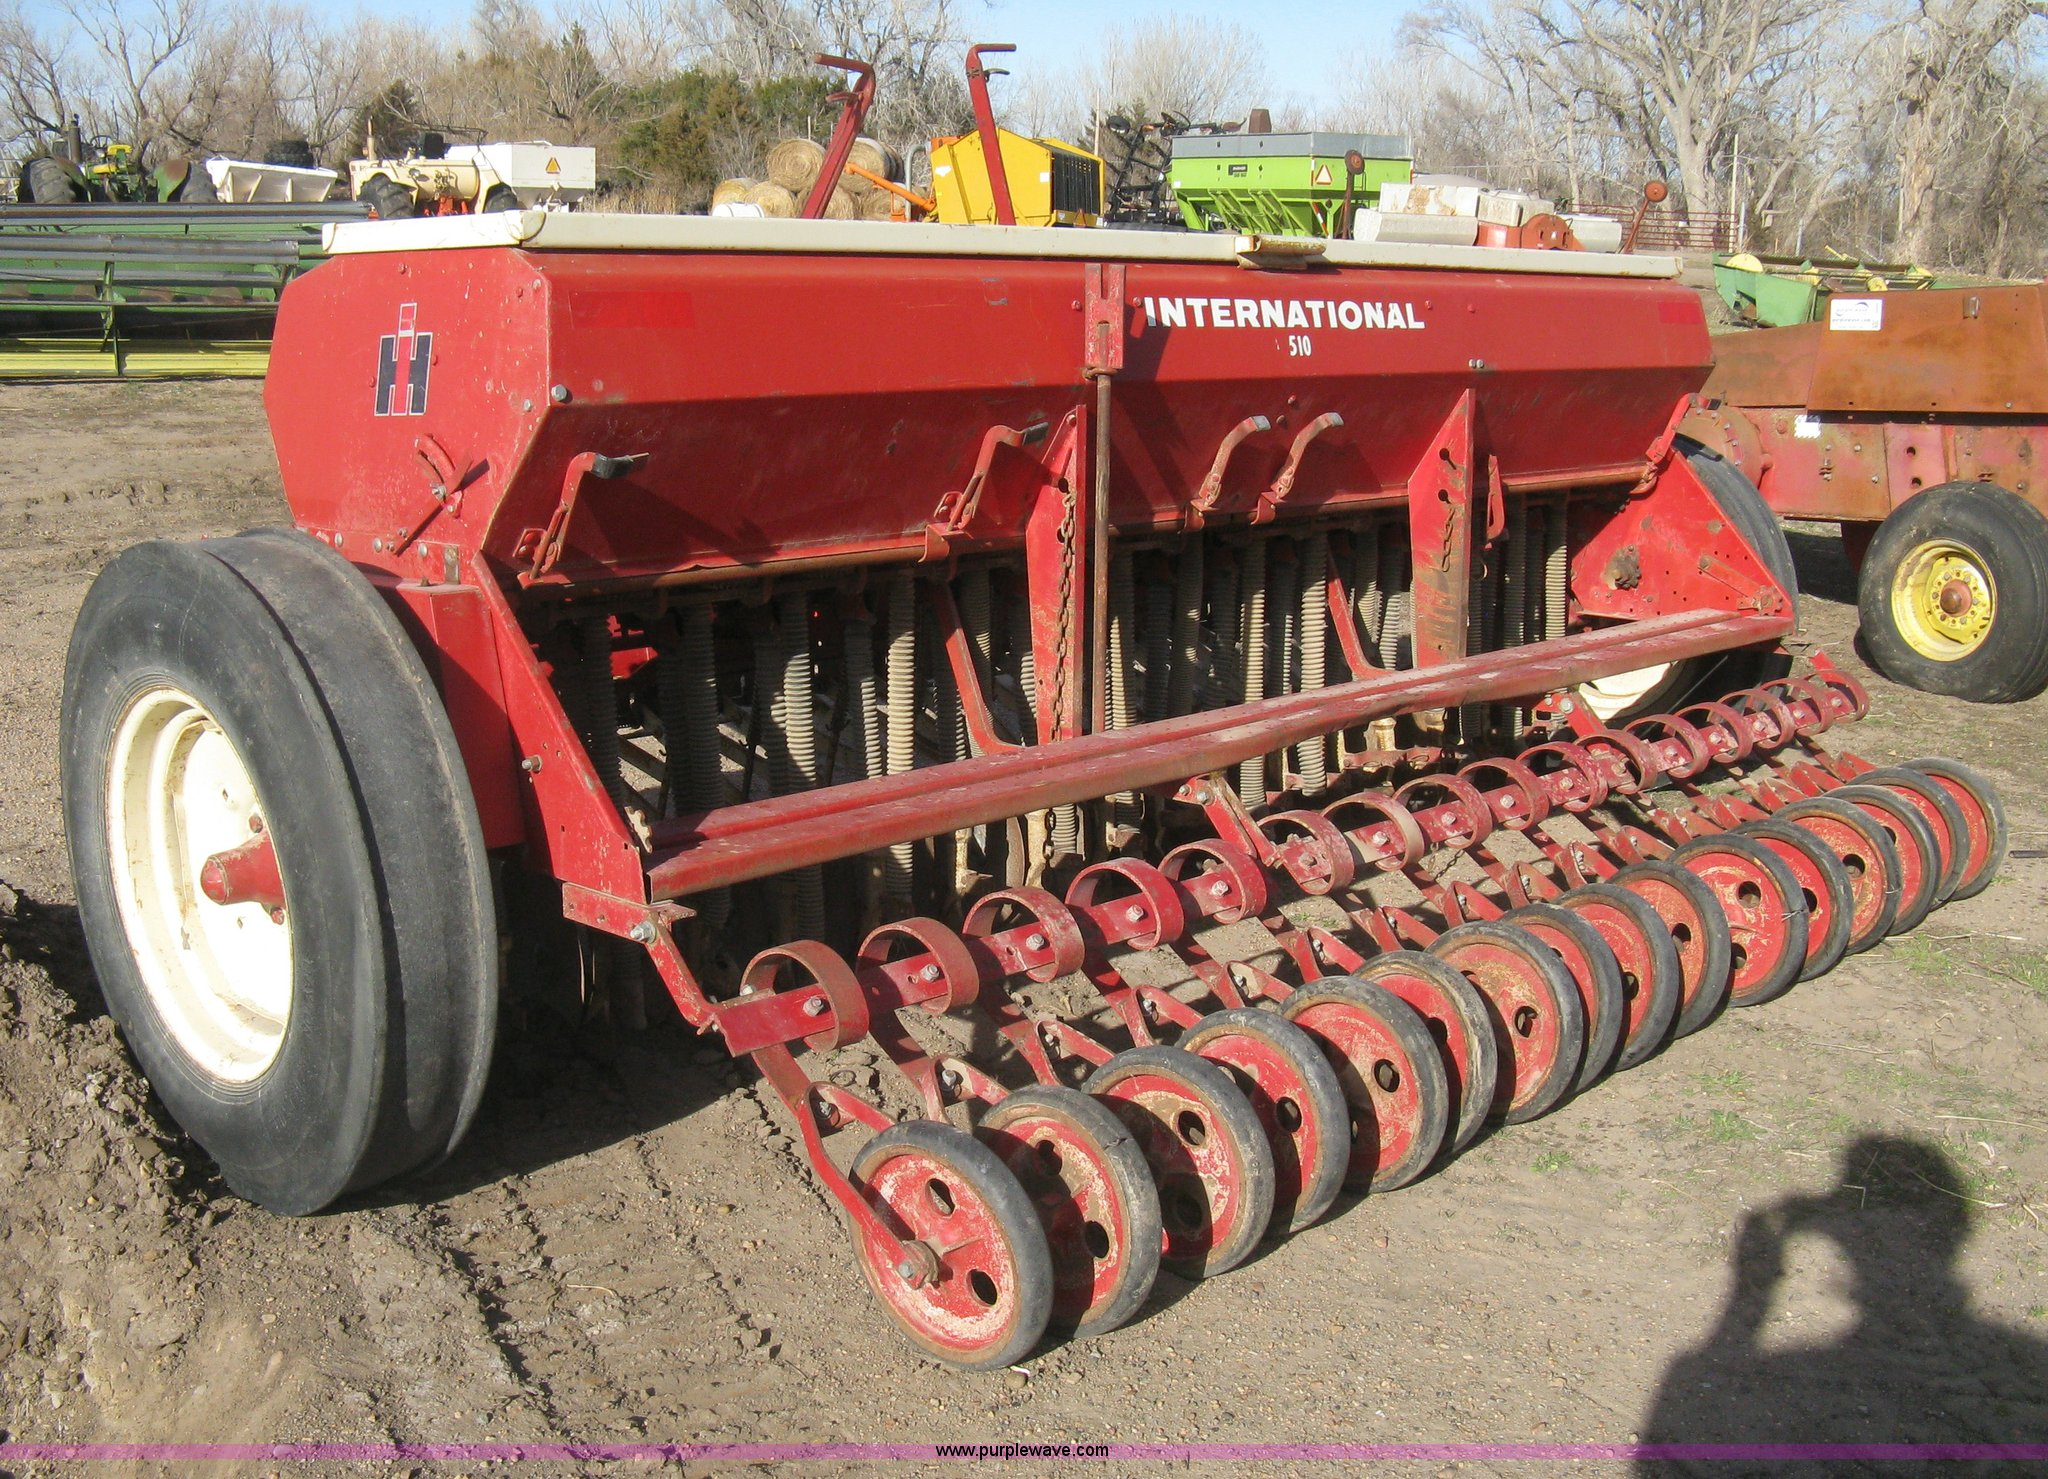 ... International 510 grain drill Full size in new window ...